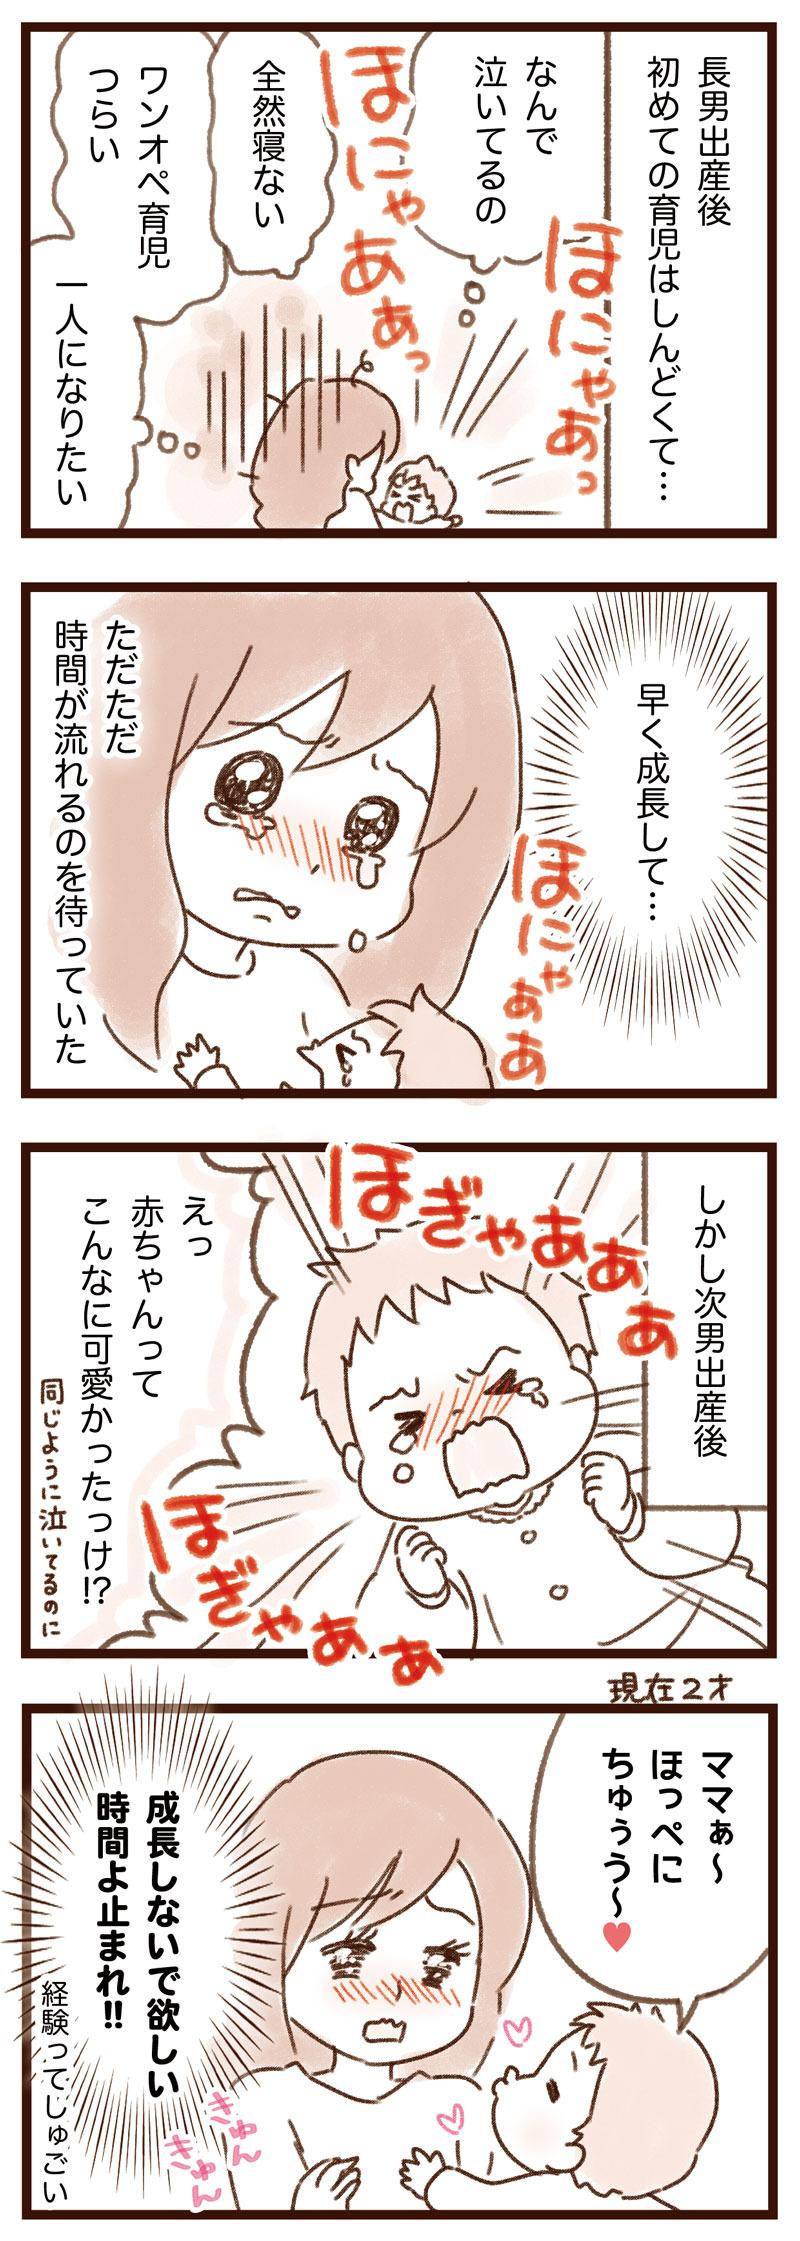 yumui277-1